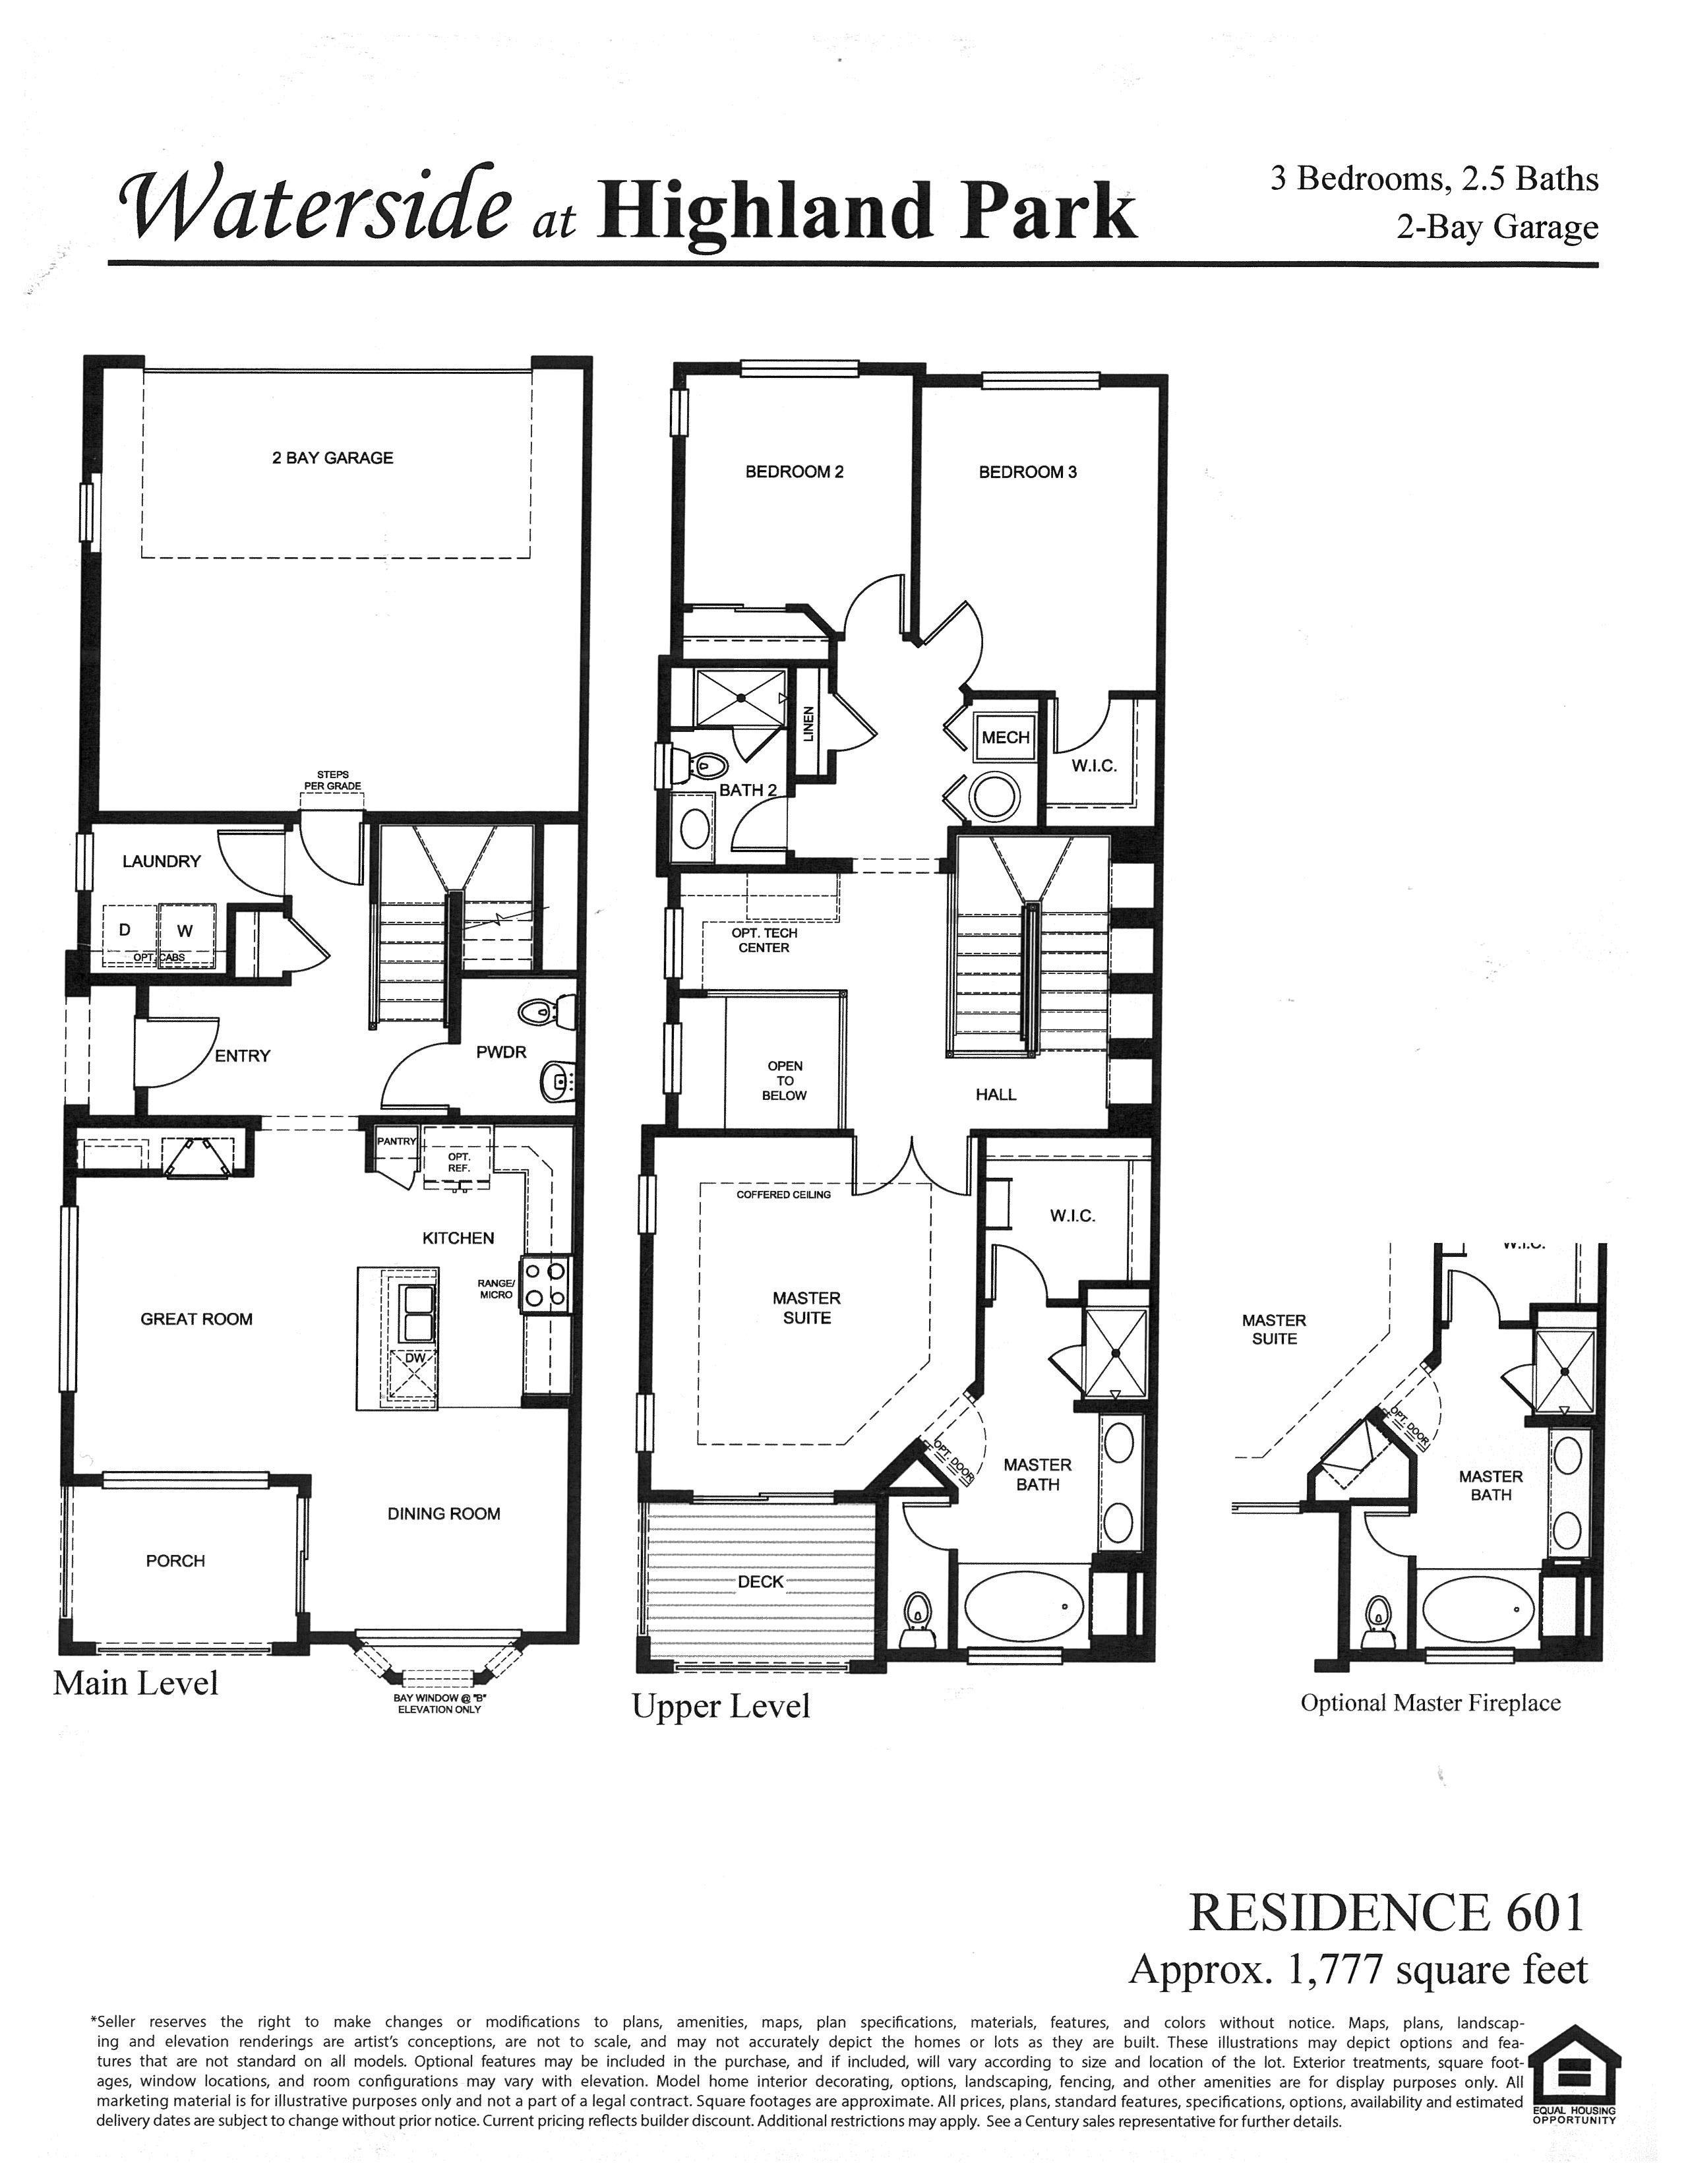 Waterside at Highland Park Floor Plan Residence 601, Centennial, CO